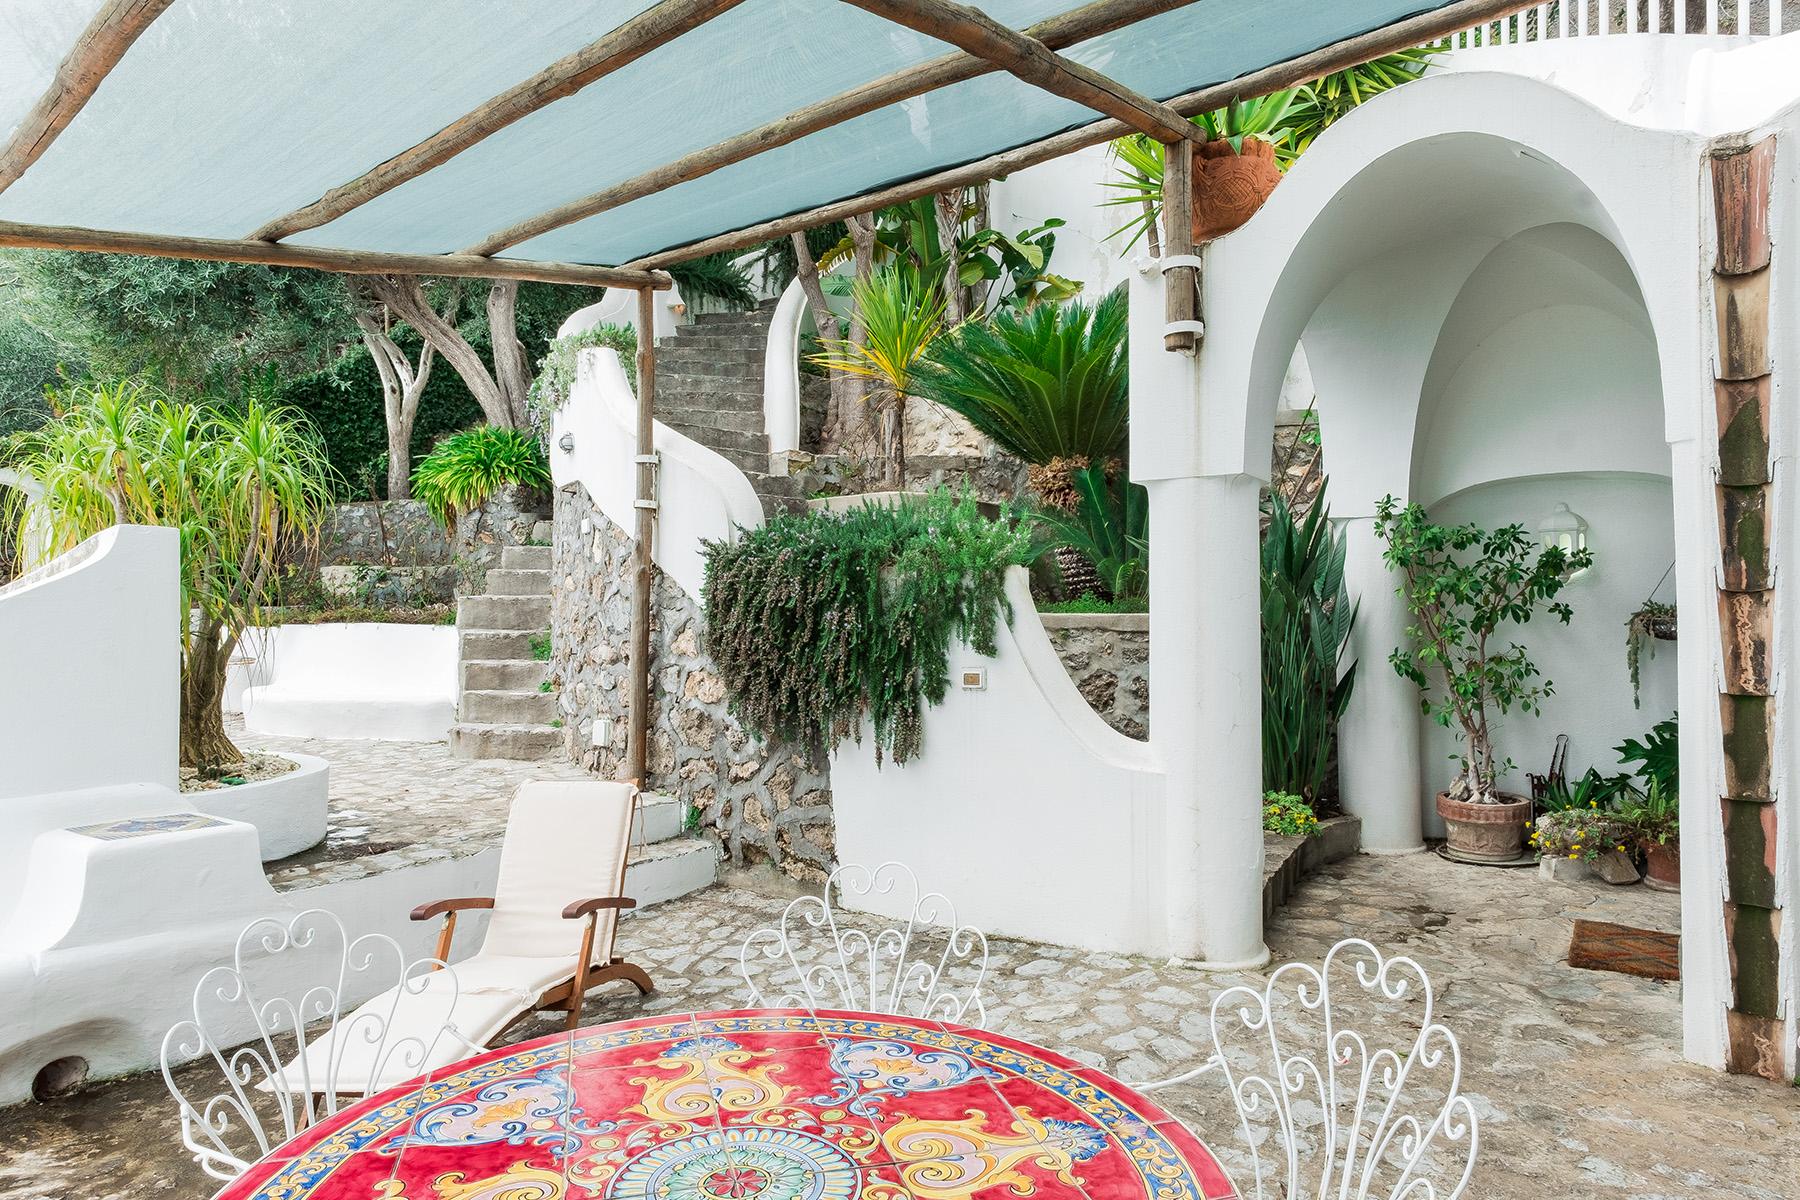 Casa indipendente in Vendita a Praiano: 4 locali, 250 mq - Foto 3